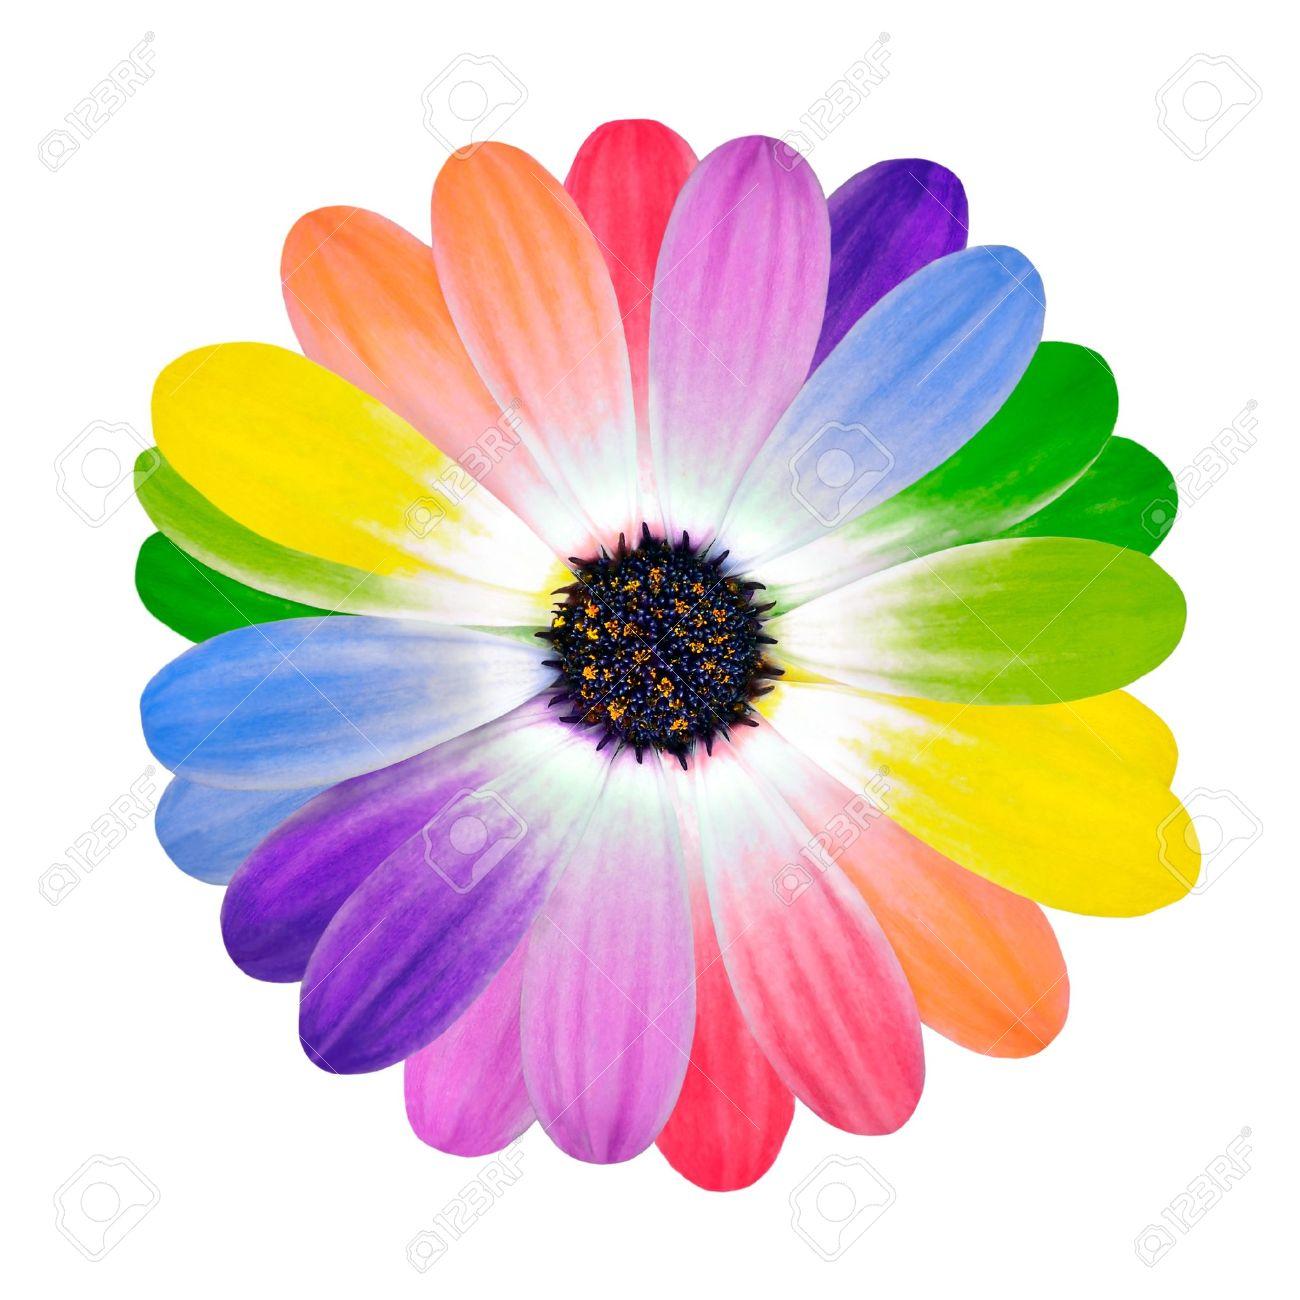 Daisy stock photos royalty free daisy images rainbow flower multi colored petals of daisy flower isolated on white background range of happy izmirmasajfo Choice Image